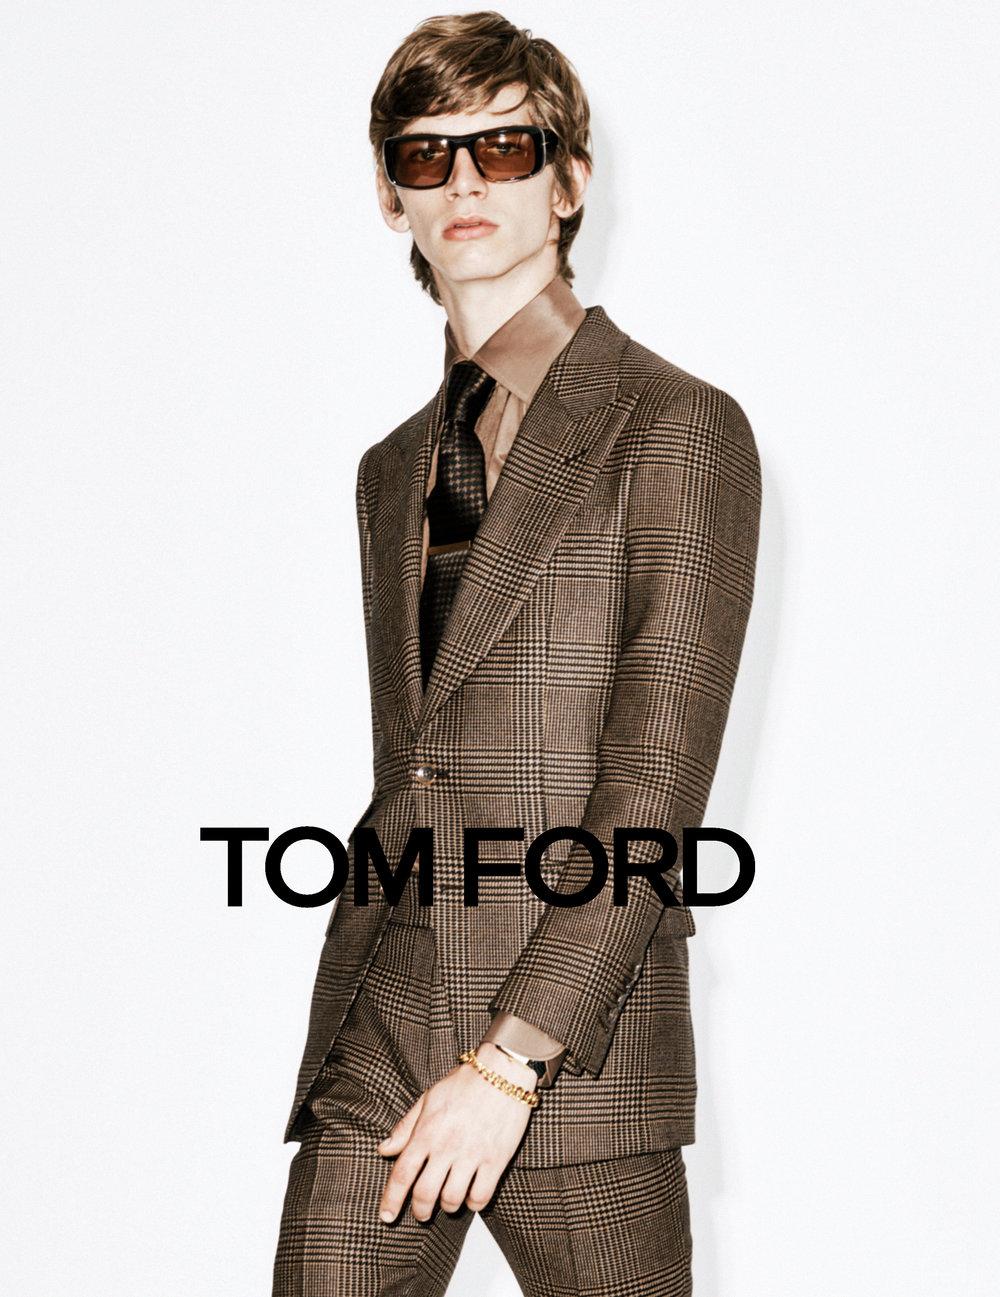 tom_ford_spring_2019_campaign35.jpg